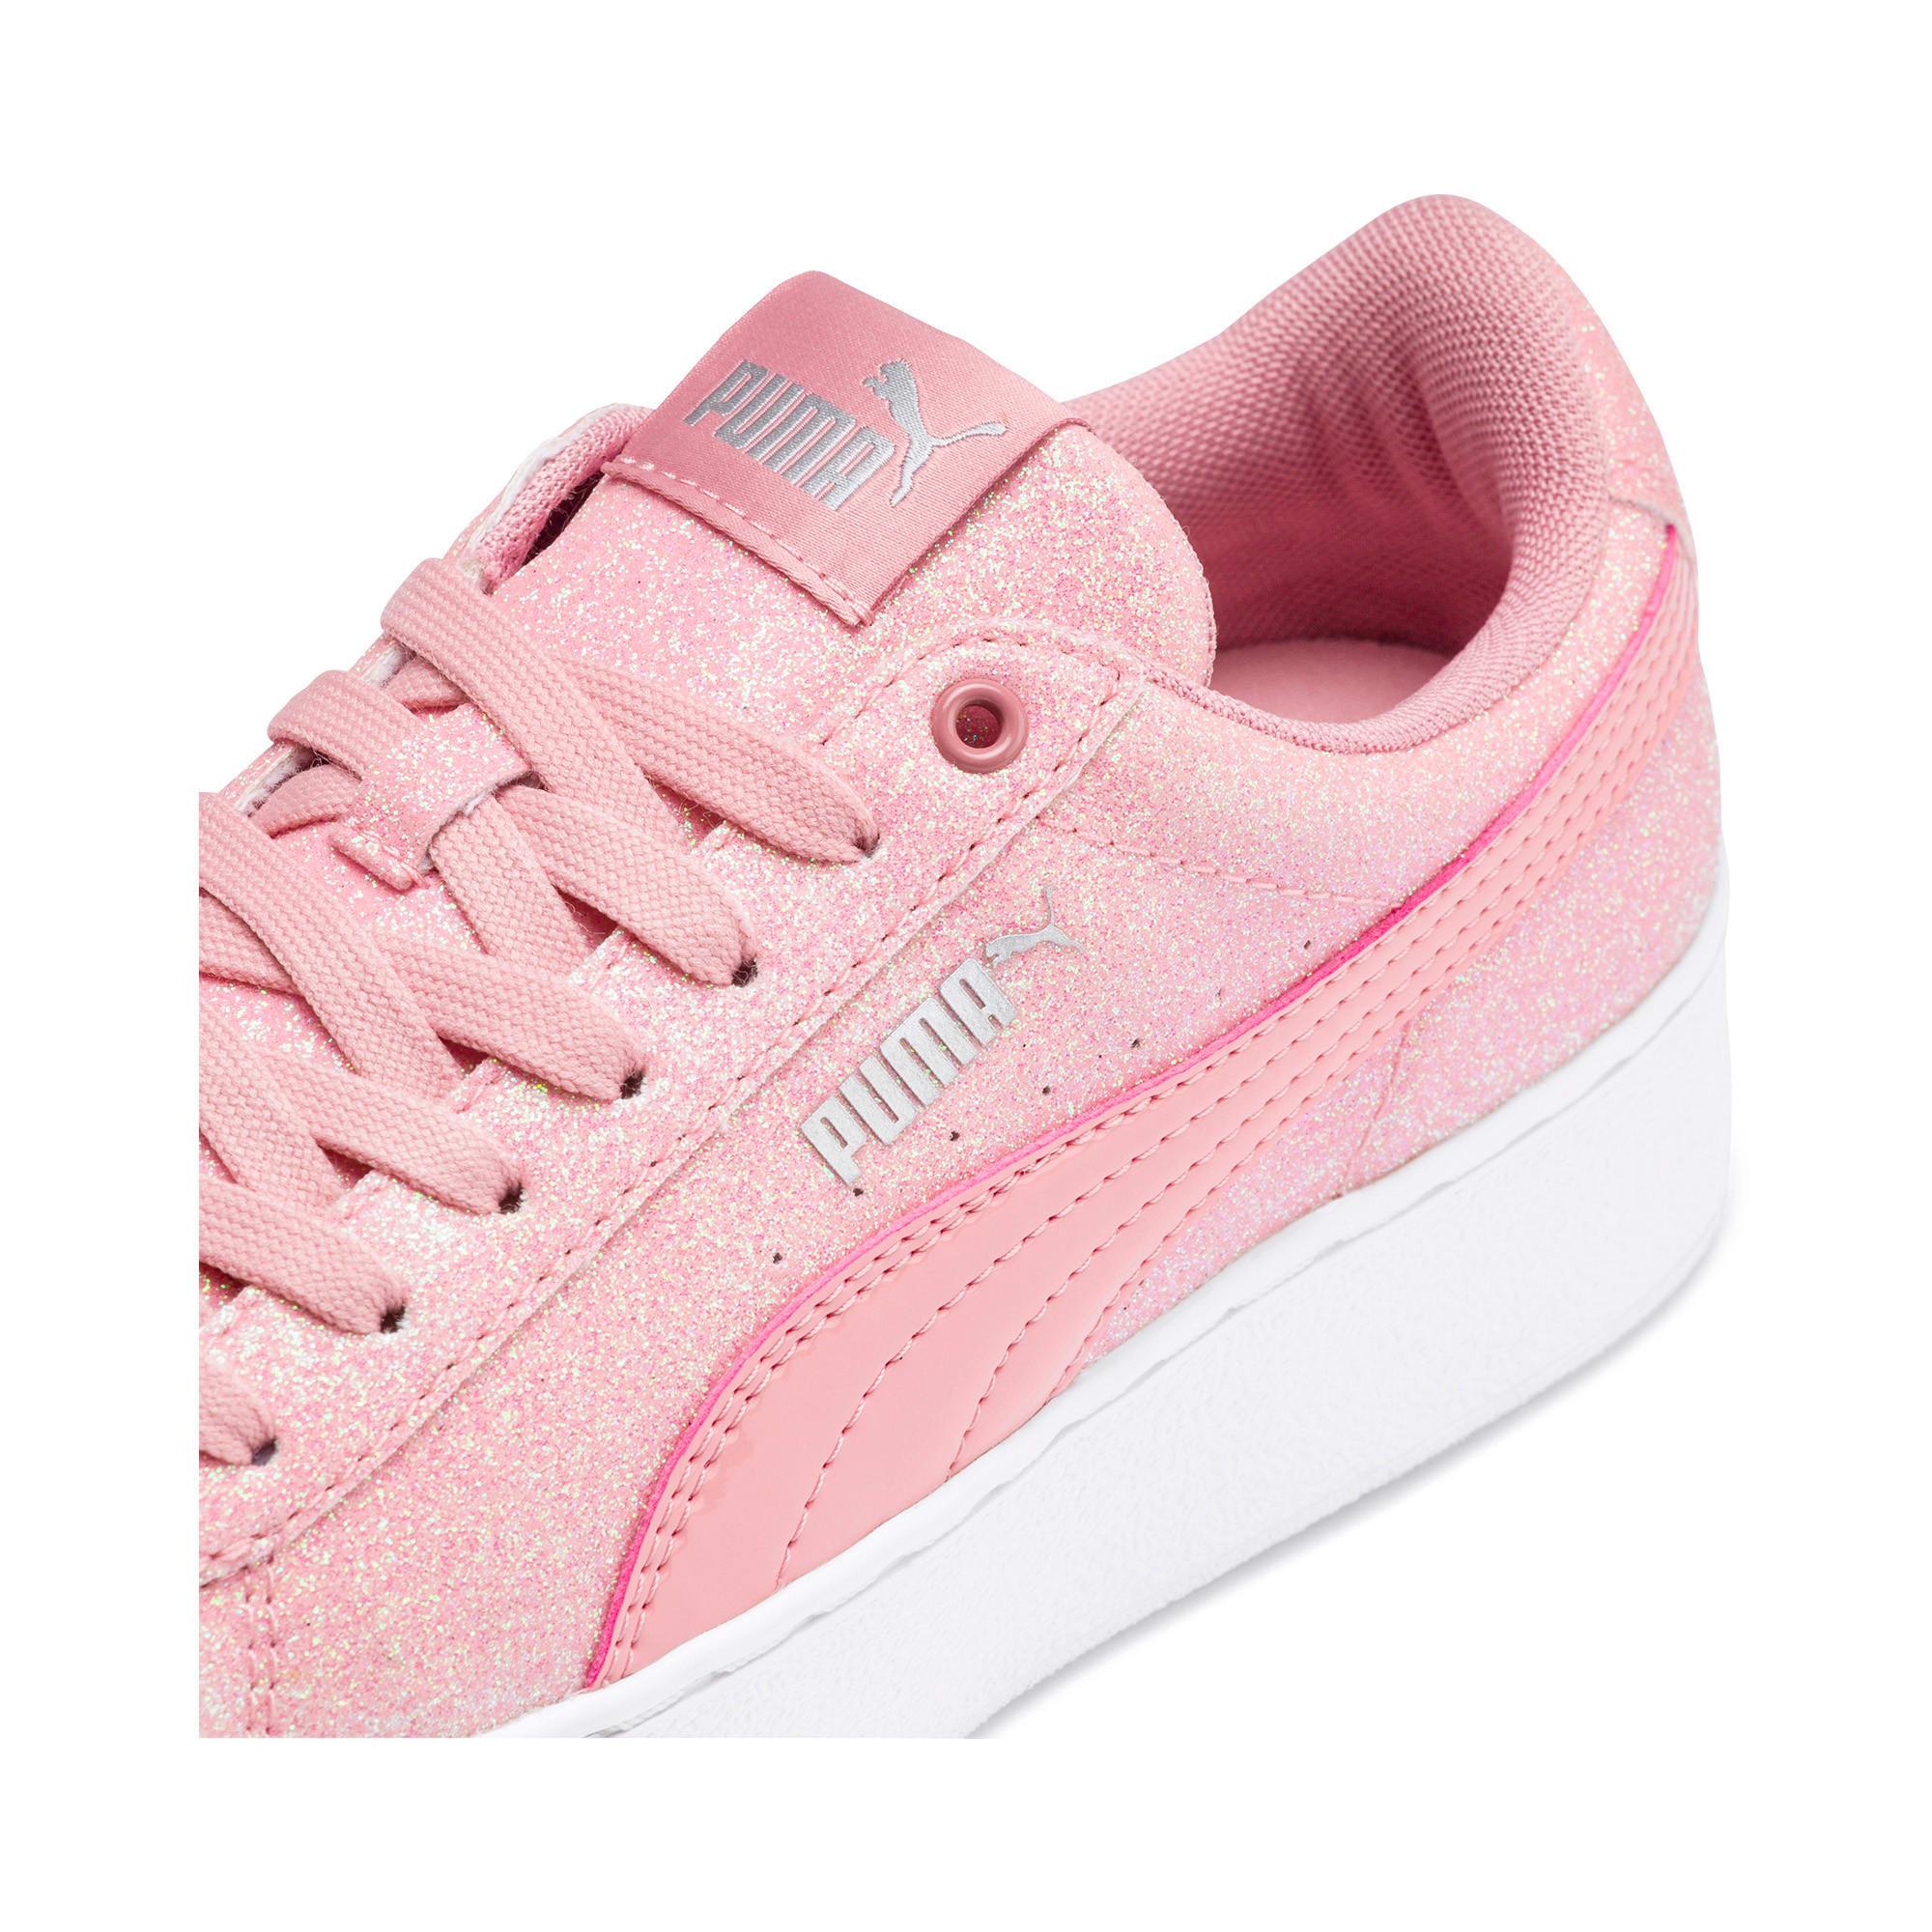 Thumbnail 7 of PUMA Vikky Platform Glitz Sneakers JR, Bridal Rose-Bridal Rose, medium